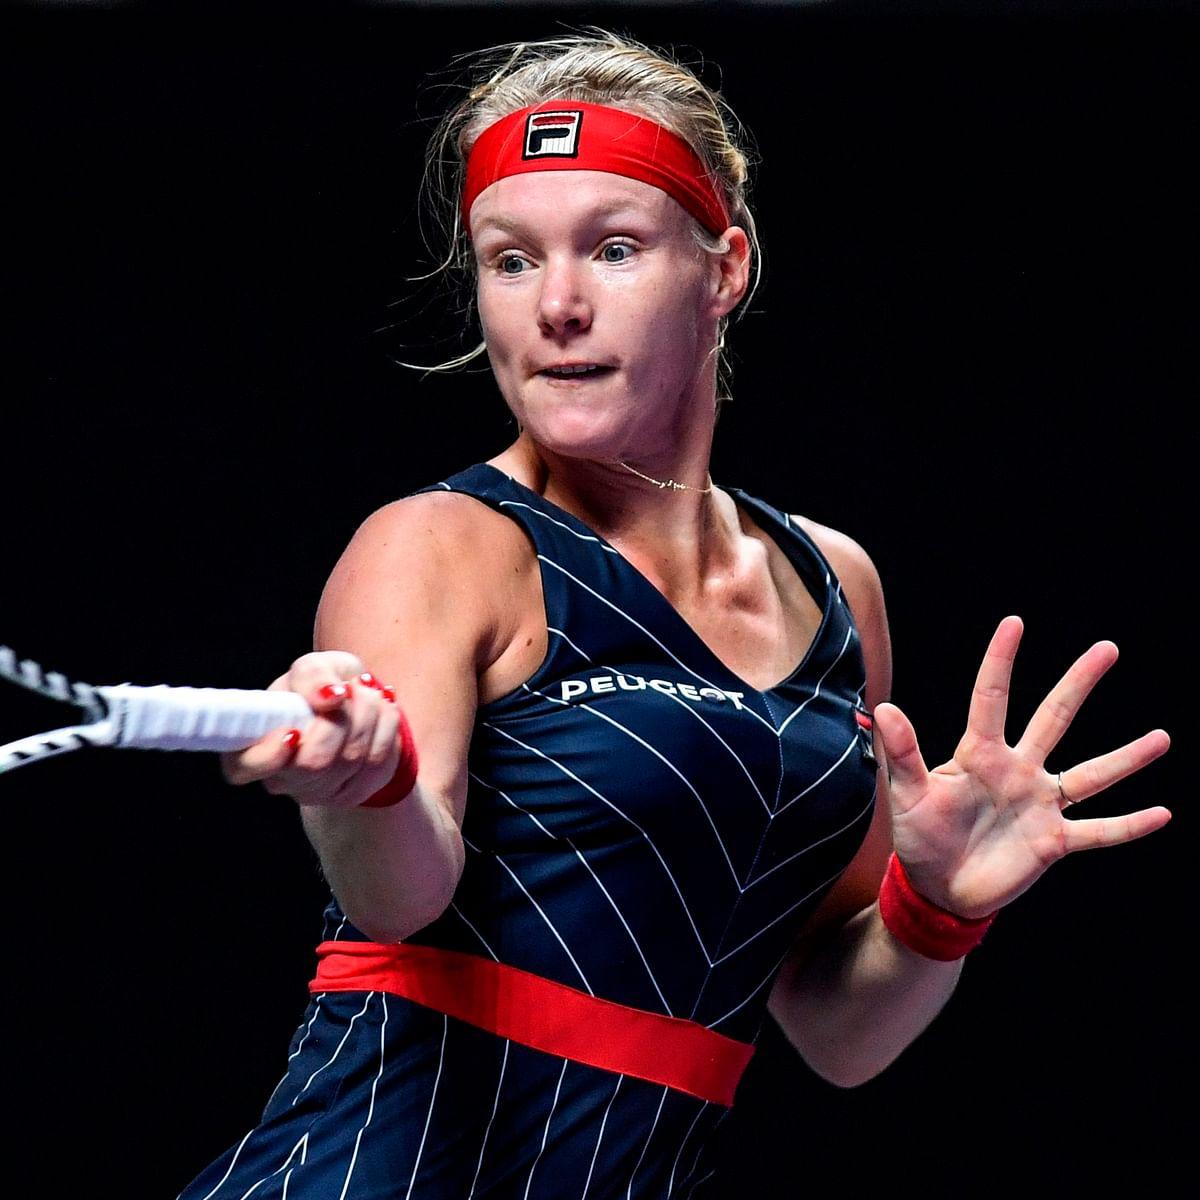 WTAFINALS: Kiki Bertens stuns Ashleigh Barty